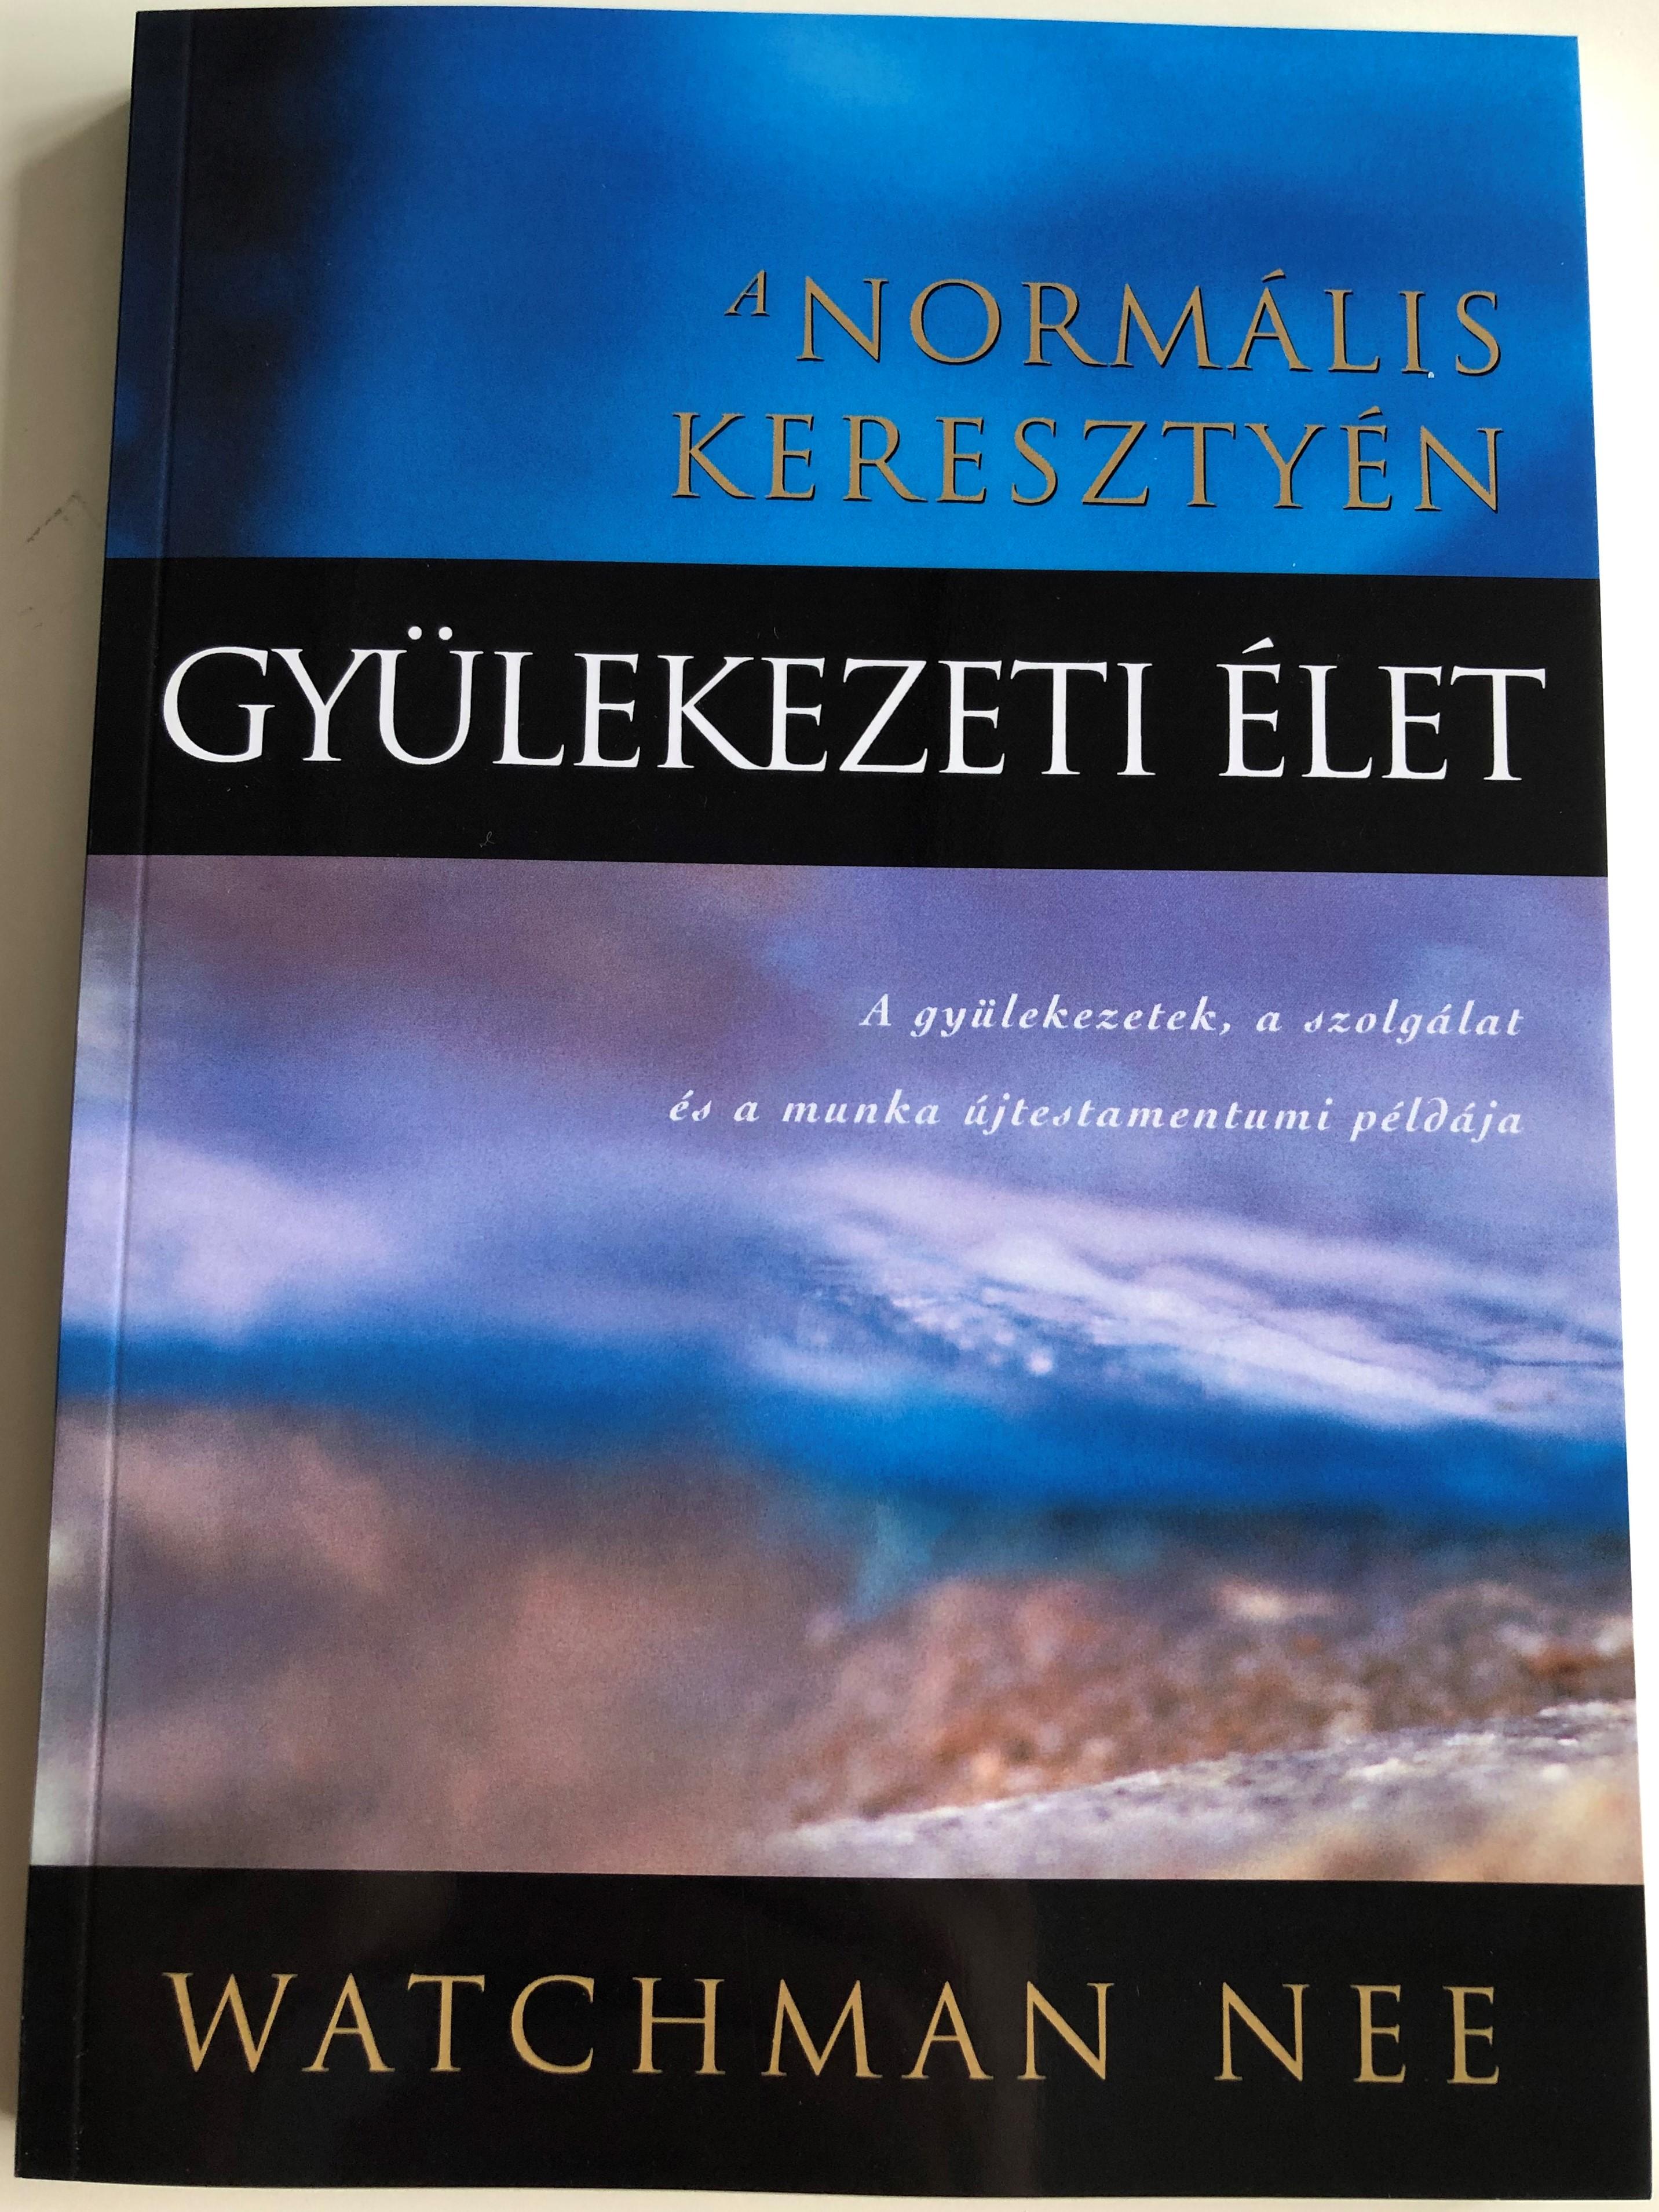 a-norm-lis-kereszty-n-gy-lekezeti-let-by-watchman-nee-the-normal-christian-church-life-in-hungarian-language-1.jpg